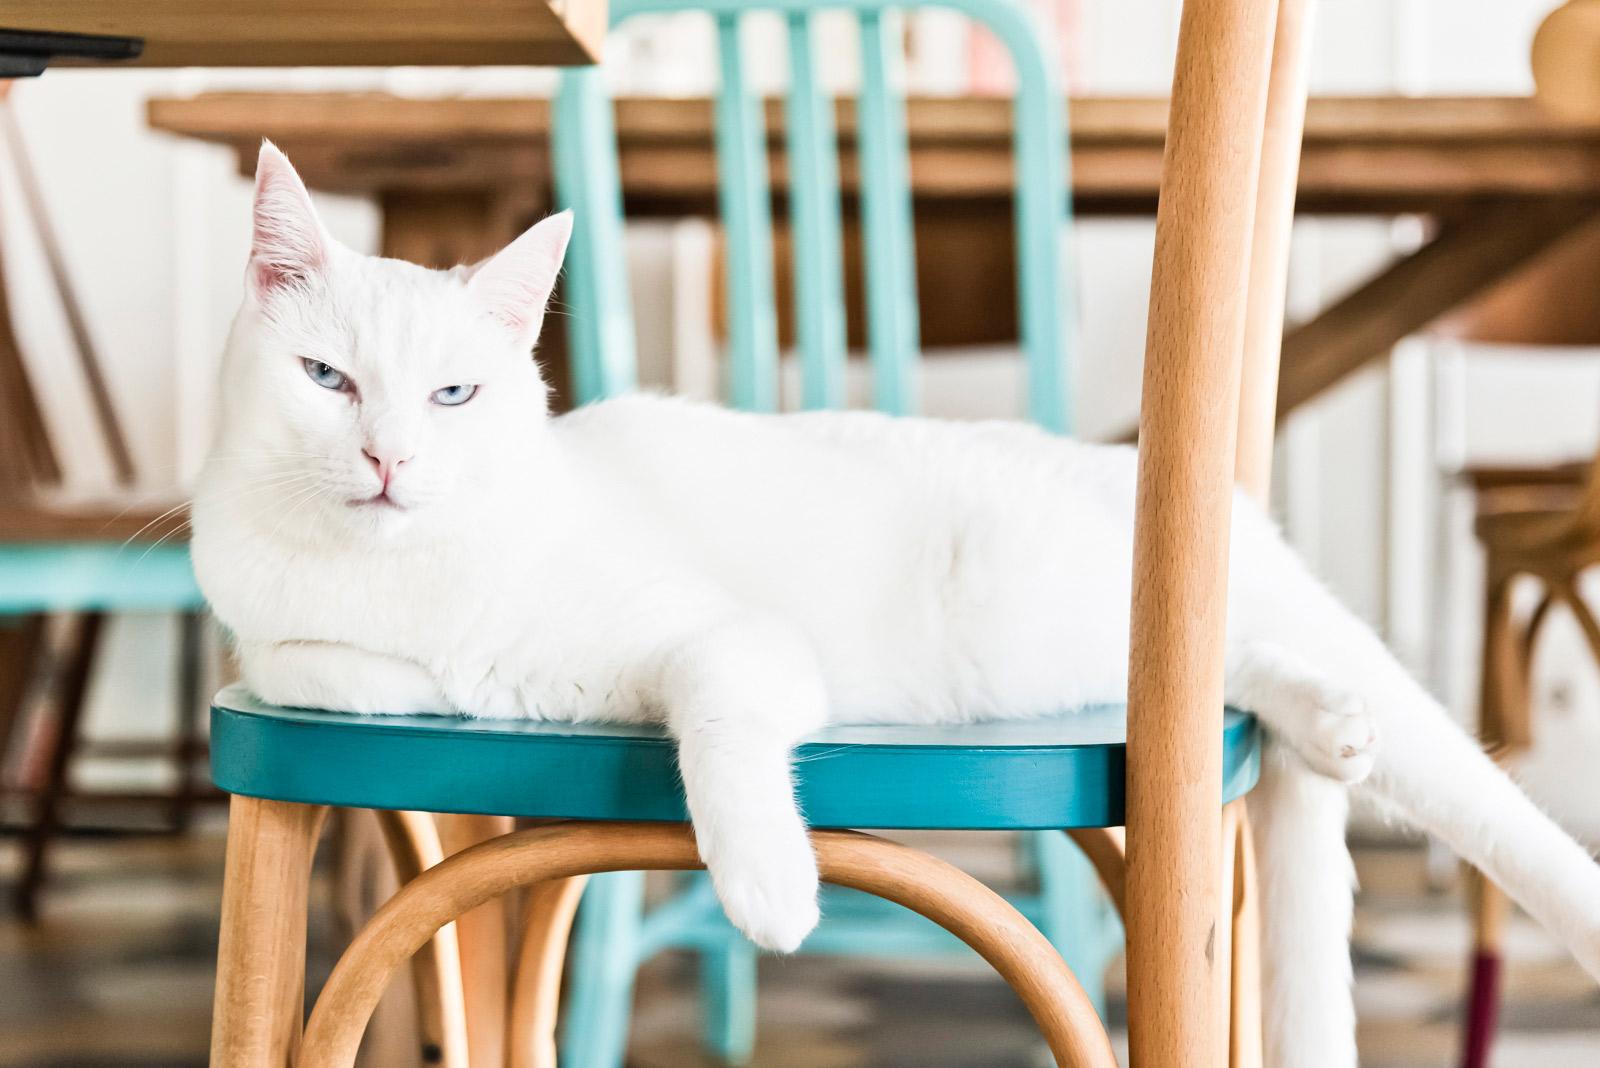 Romeow cat bistrot a Ostiense: una felice oasi felina e veg